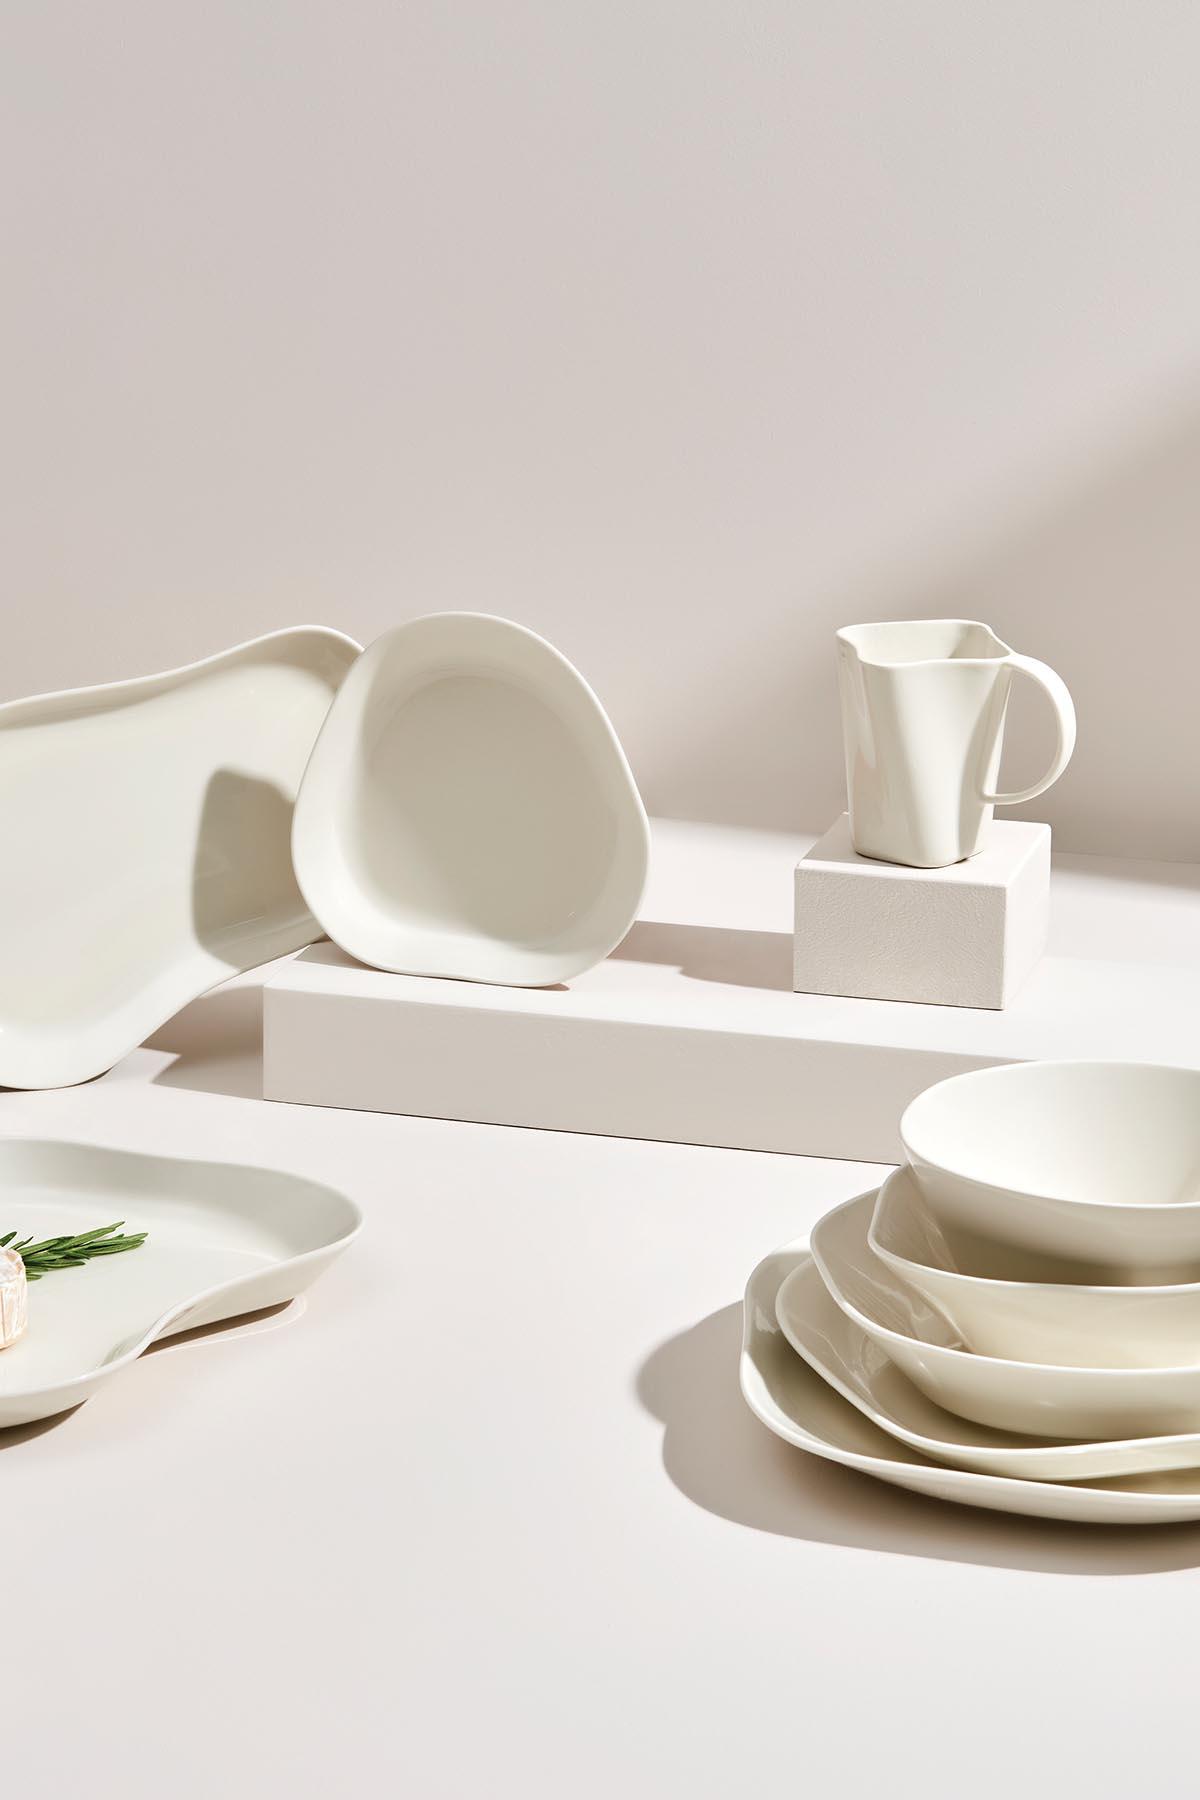 Kütahya Porselen Skallop 2′li 23 cm Büyük Kase Seti Krem